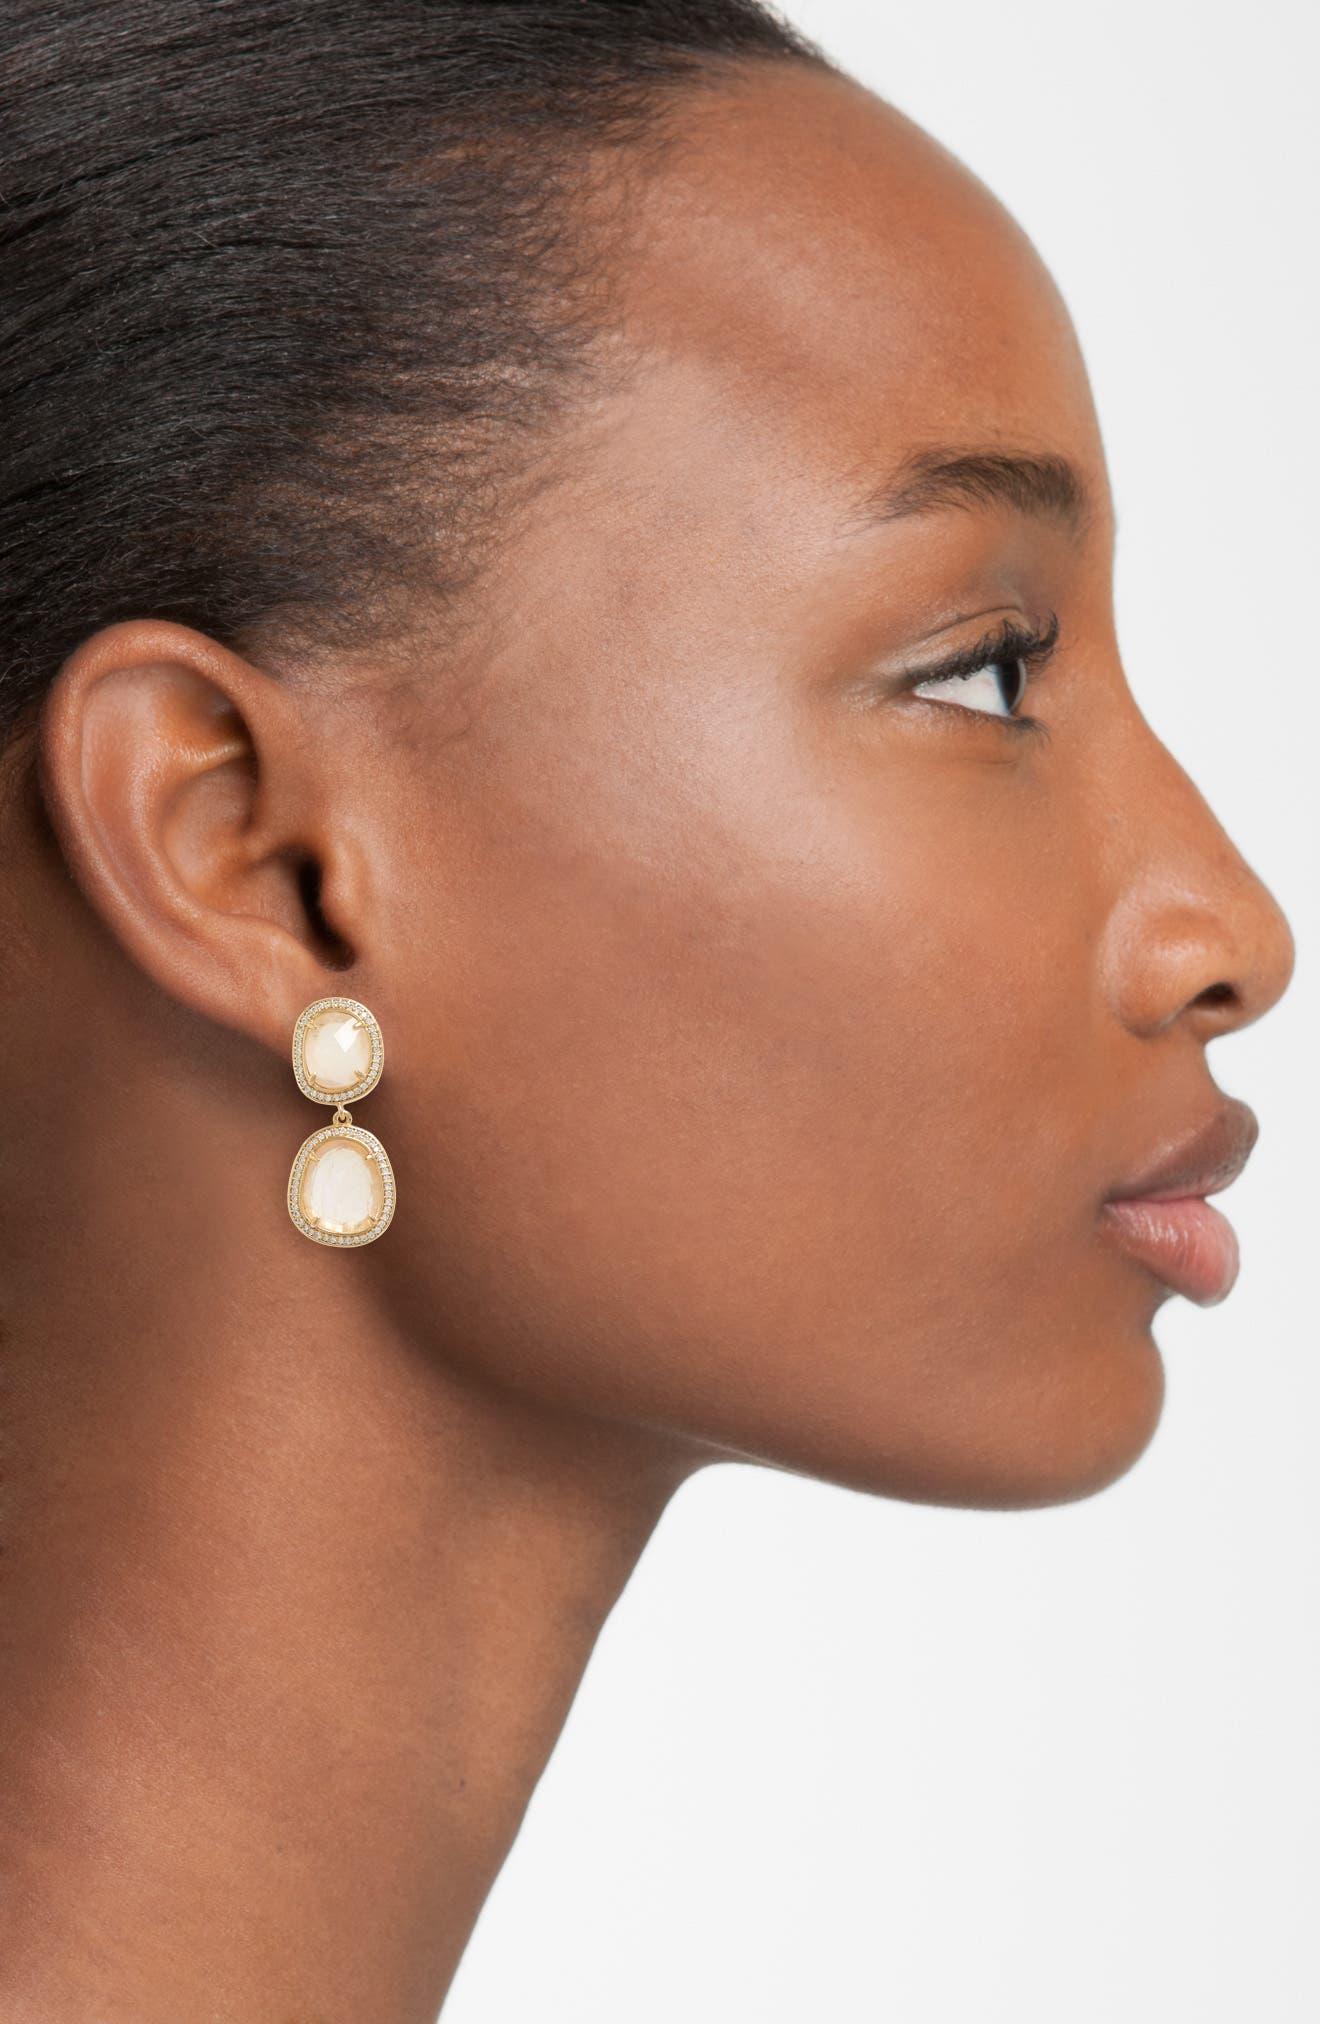 Double Drop Earrings,                             Alternate thumbnail 2, color,                             Moonstone/ Gold